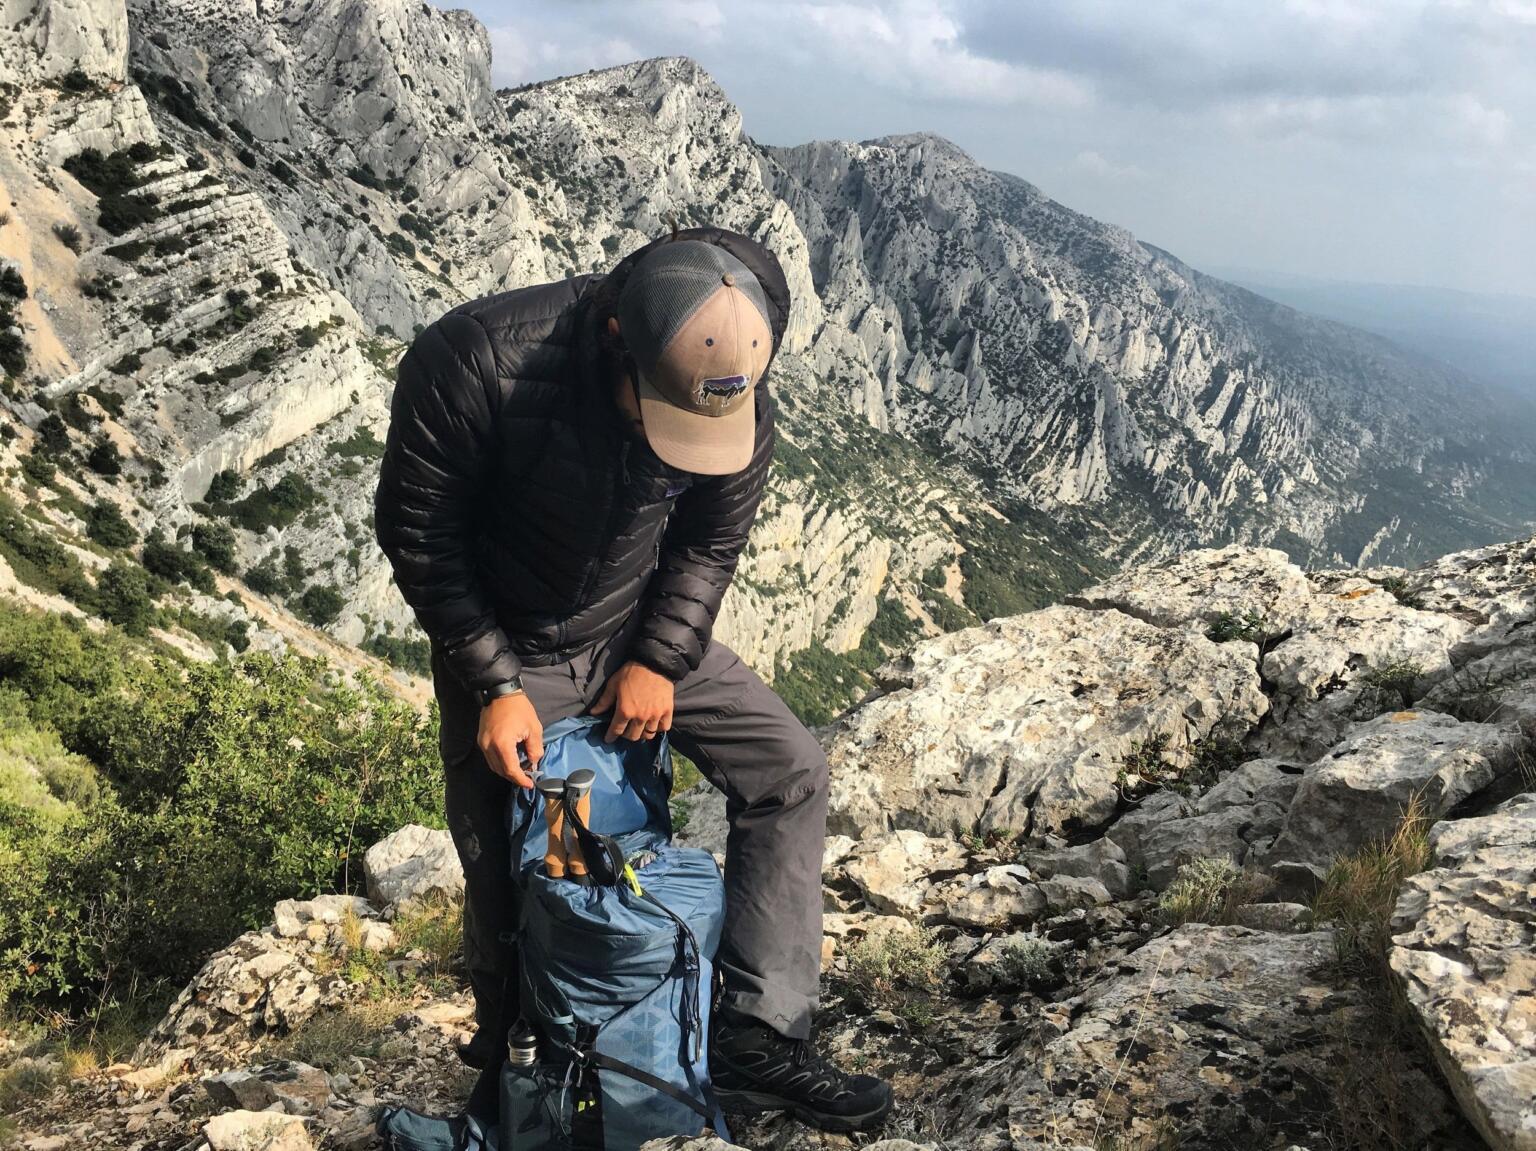 stowing trekking poles inside daypack